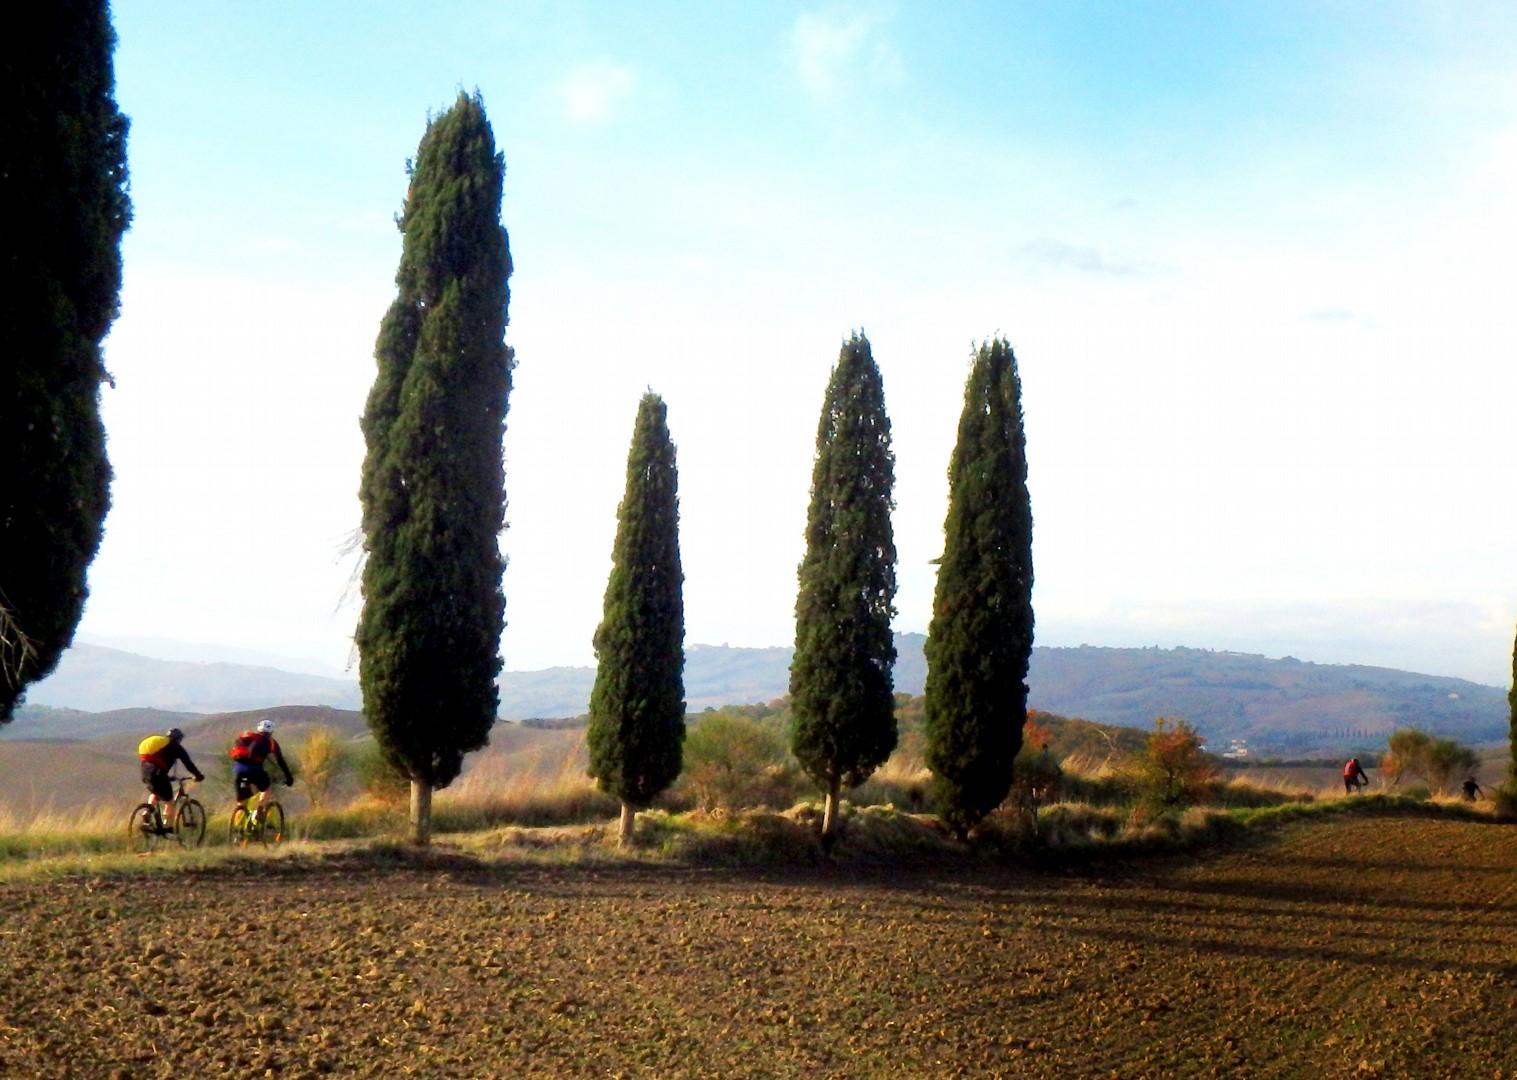 self-guided-mountain-bike-holiday-tuscany-to-rome-trip-saddle-skedaddle.jpg - Italy - Via Francigena (Tuscany to Rome) - Self-Guided Mountain Bike Holiday - Mountain Biking